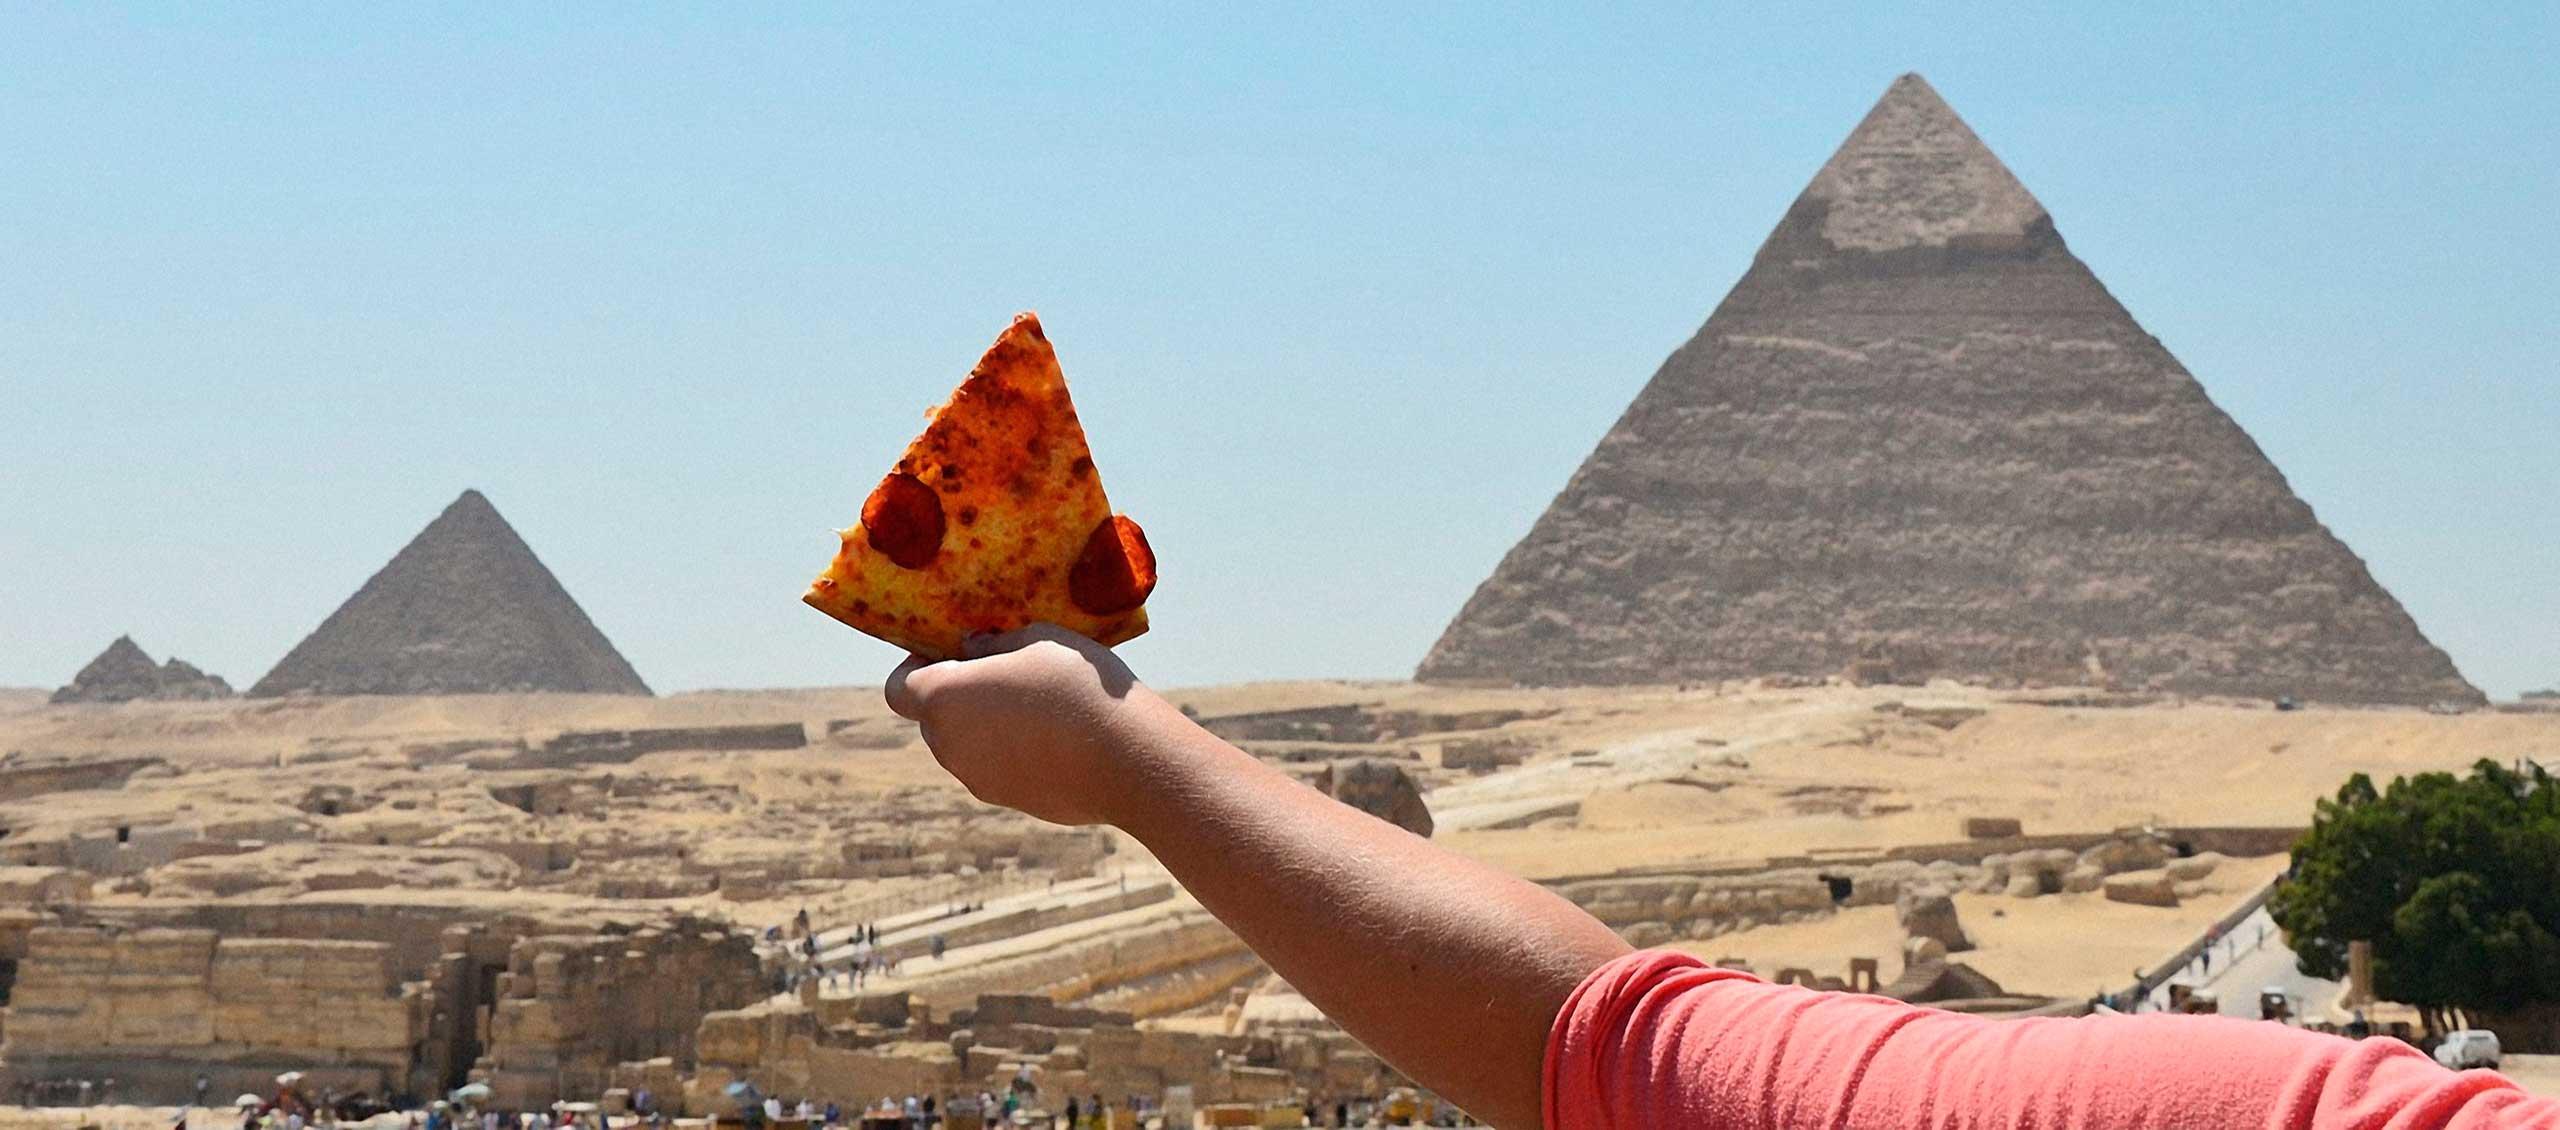 Pizza Pyramids, Cairo, Egypt, 2014.